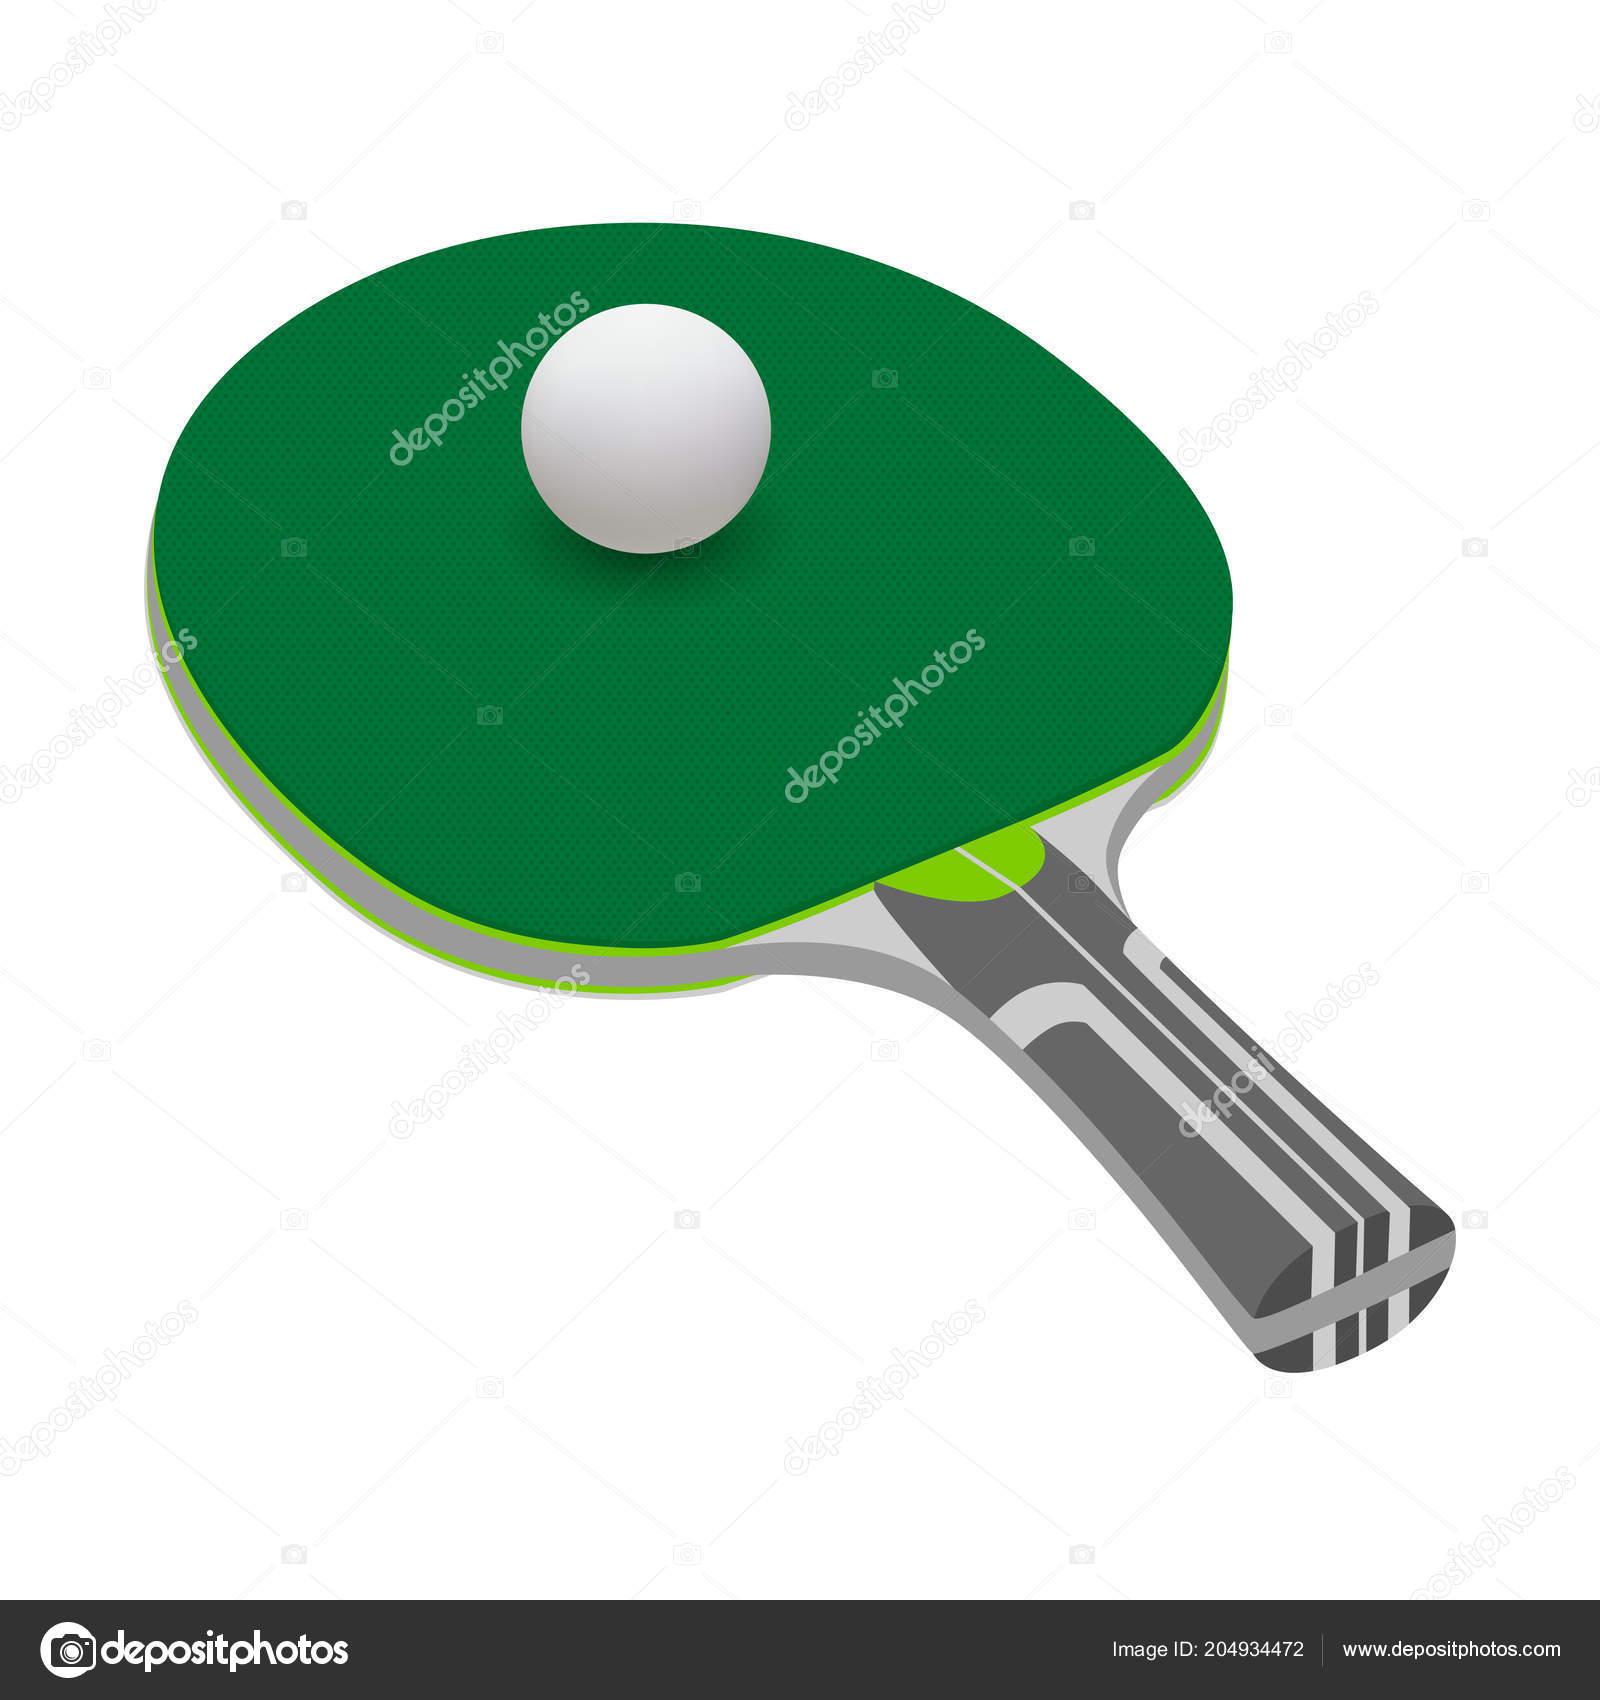 9b3e4346f Raquete Tênis Vetor Fundo Branco Raquete Pong Ping Vetor Bola — Vetores de  Stock